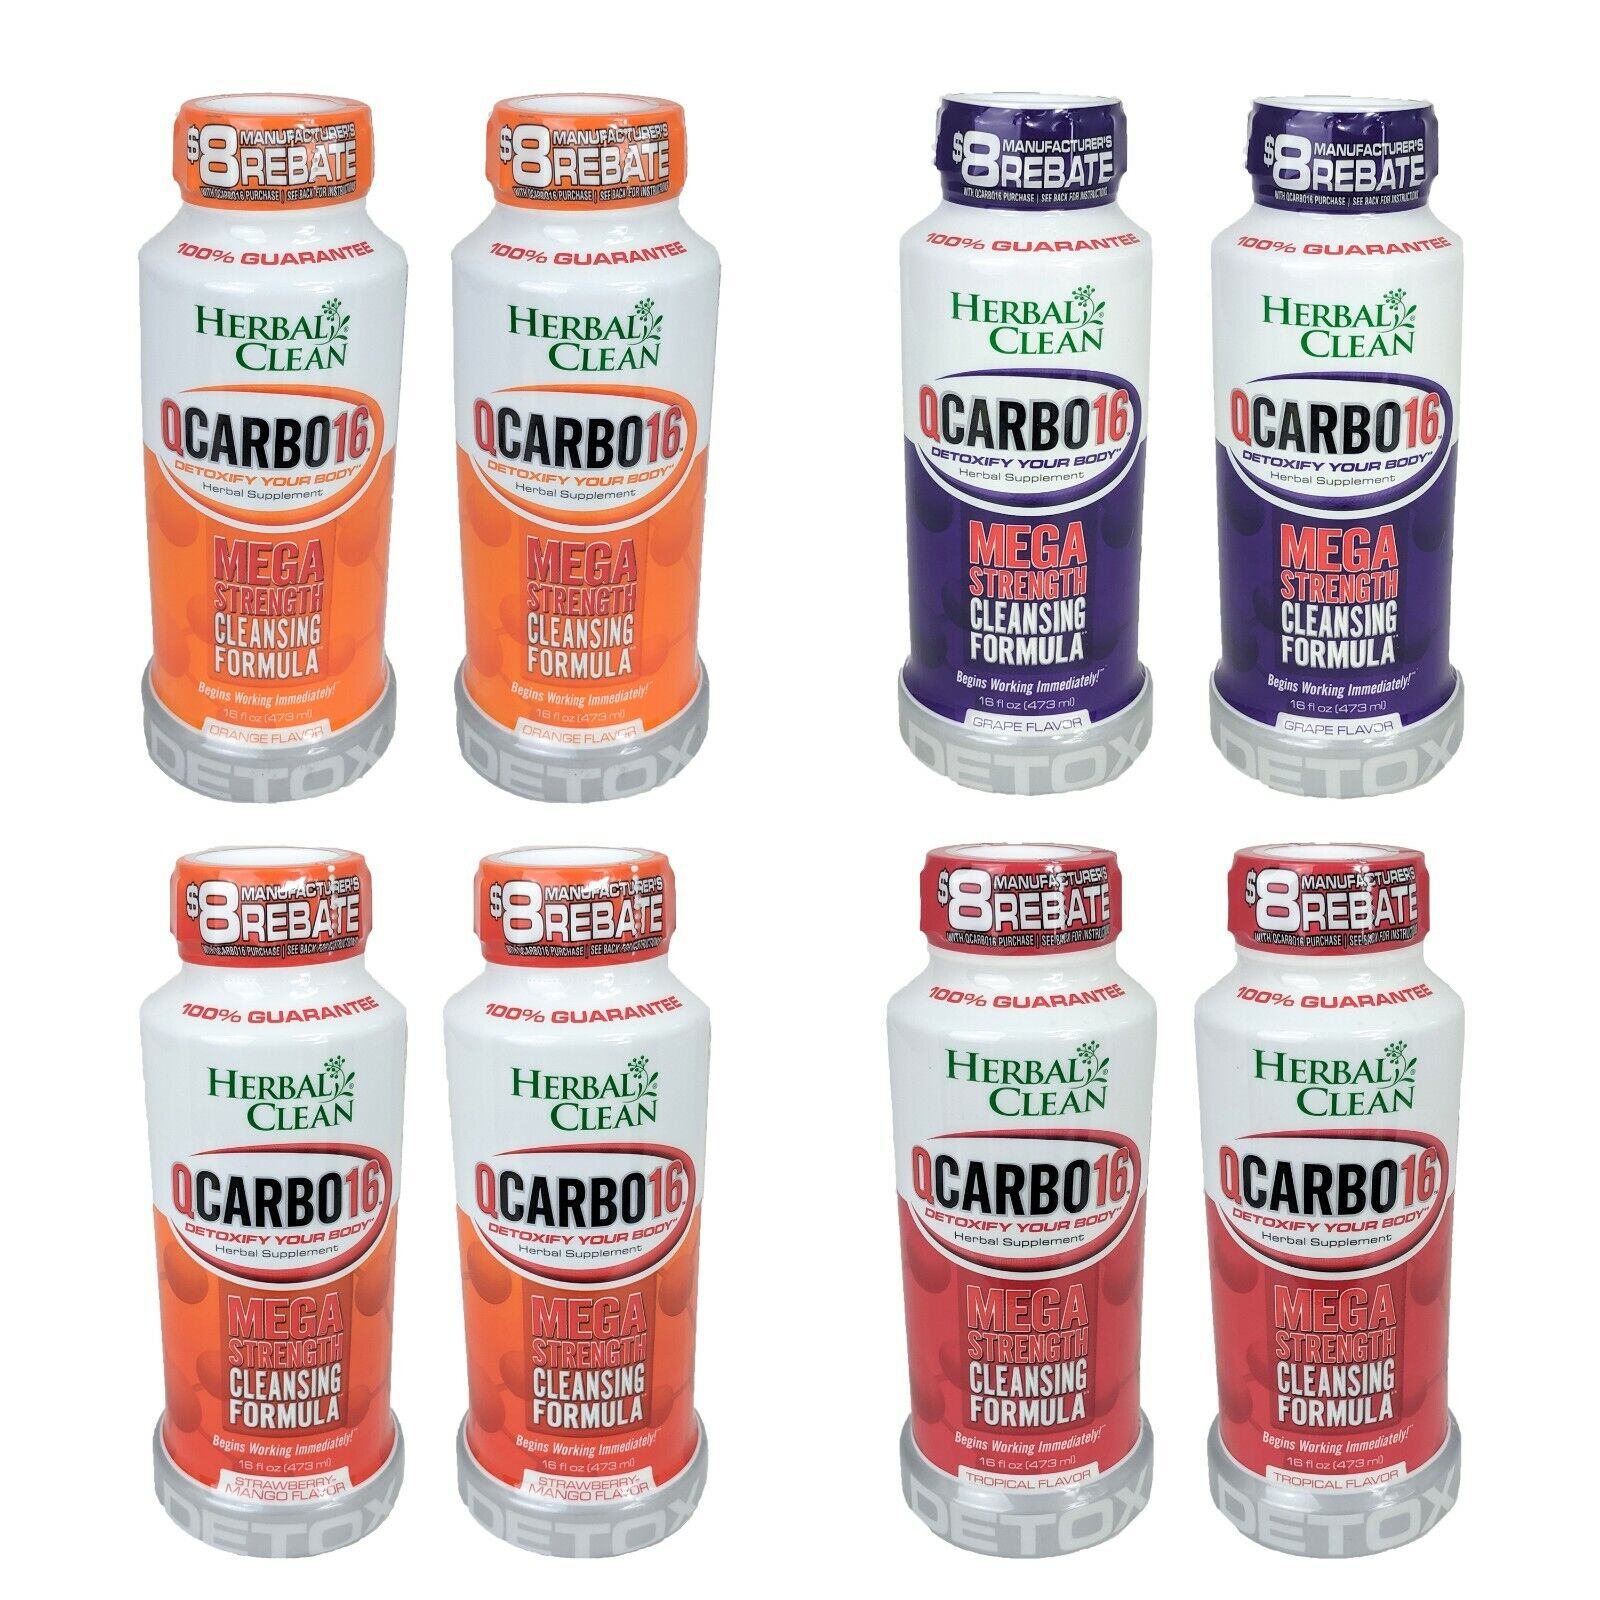 2-Pack Herbal Clean Qcarbo16 Mega Strength Cleansing Detox, 16oz, YOU CHOOSE